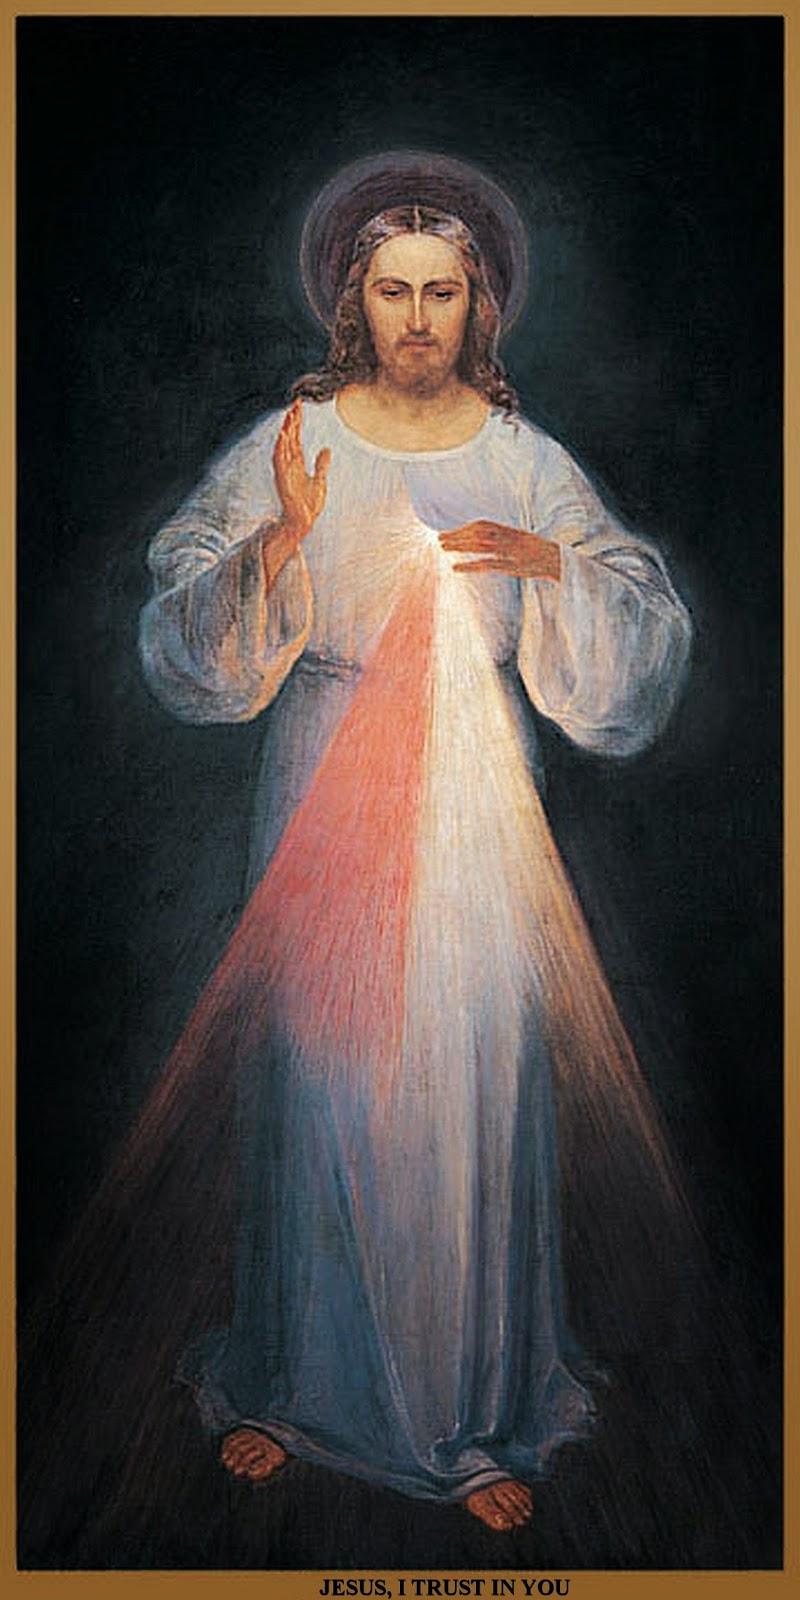 Daily Catholic Mass Readings: Daily Catholic Mass Readings